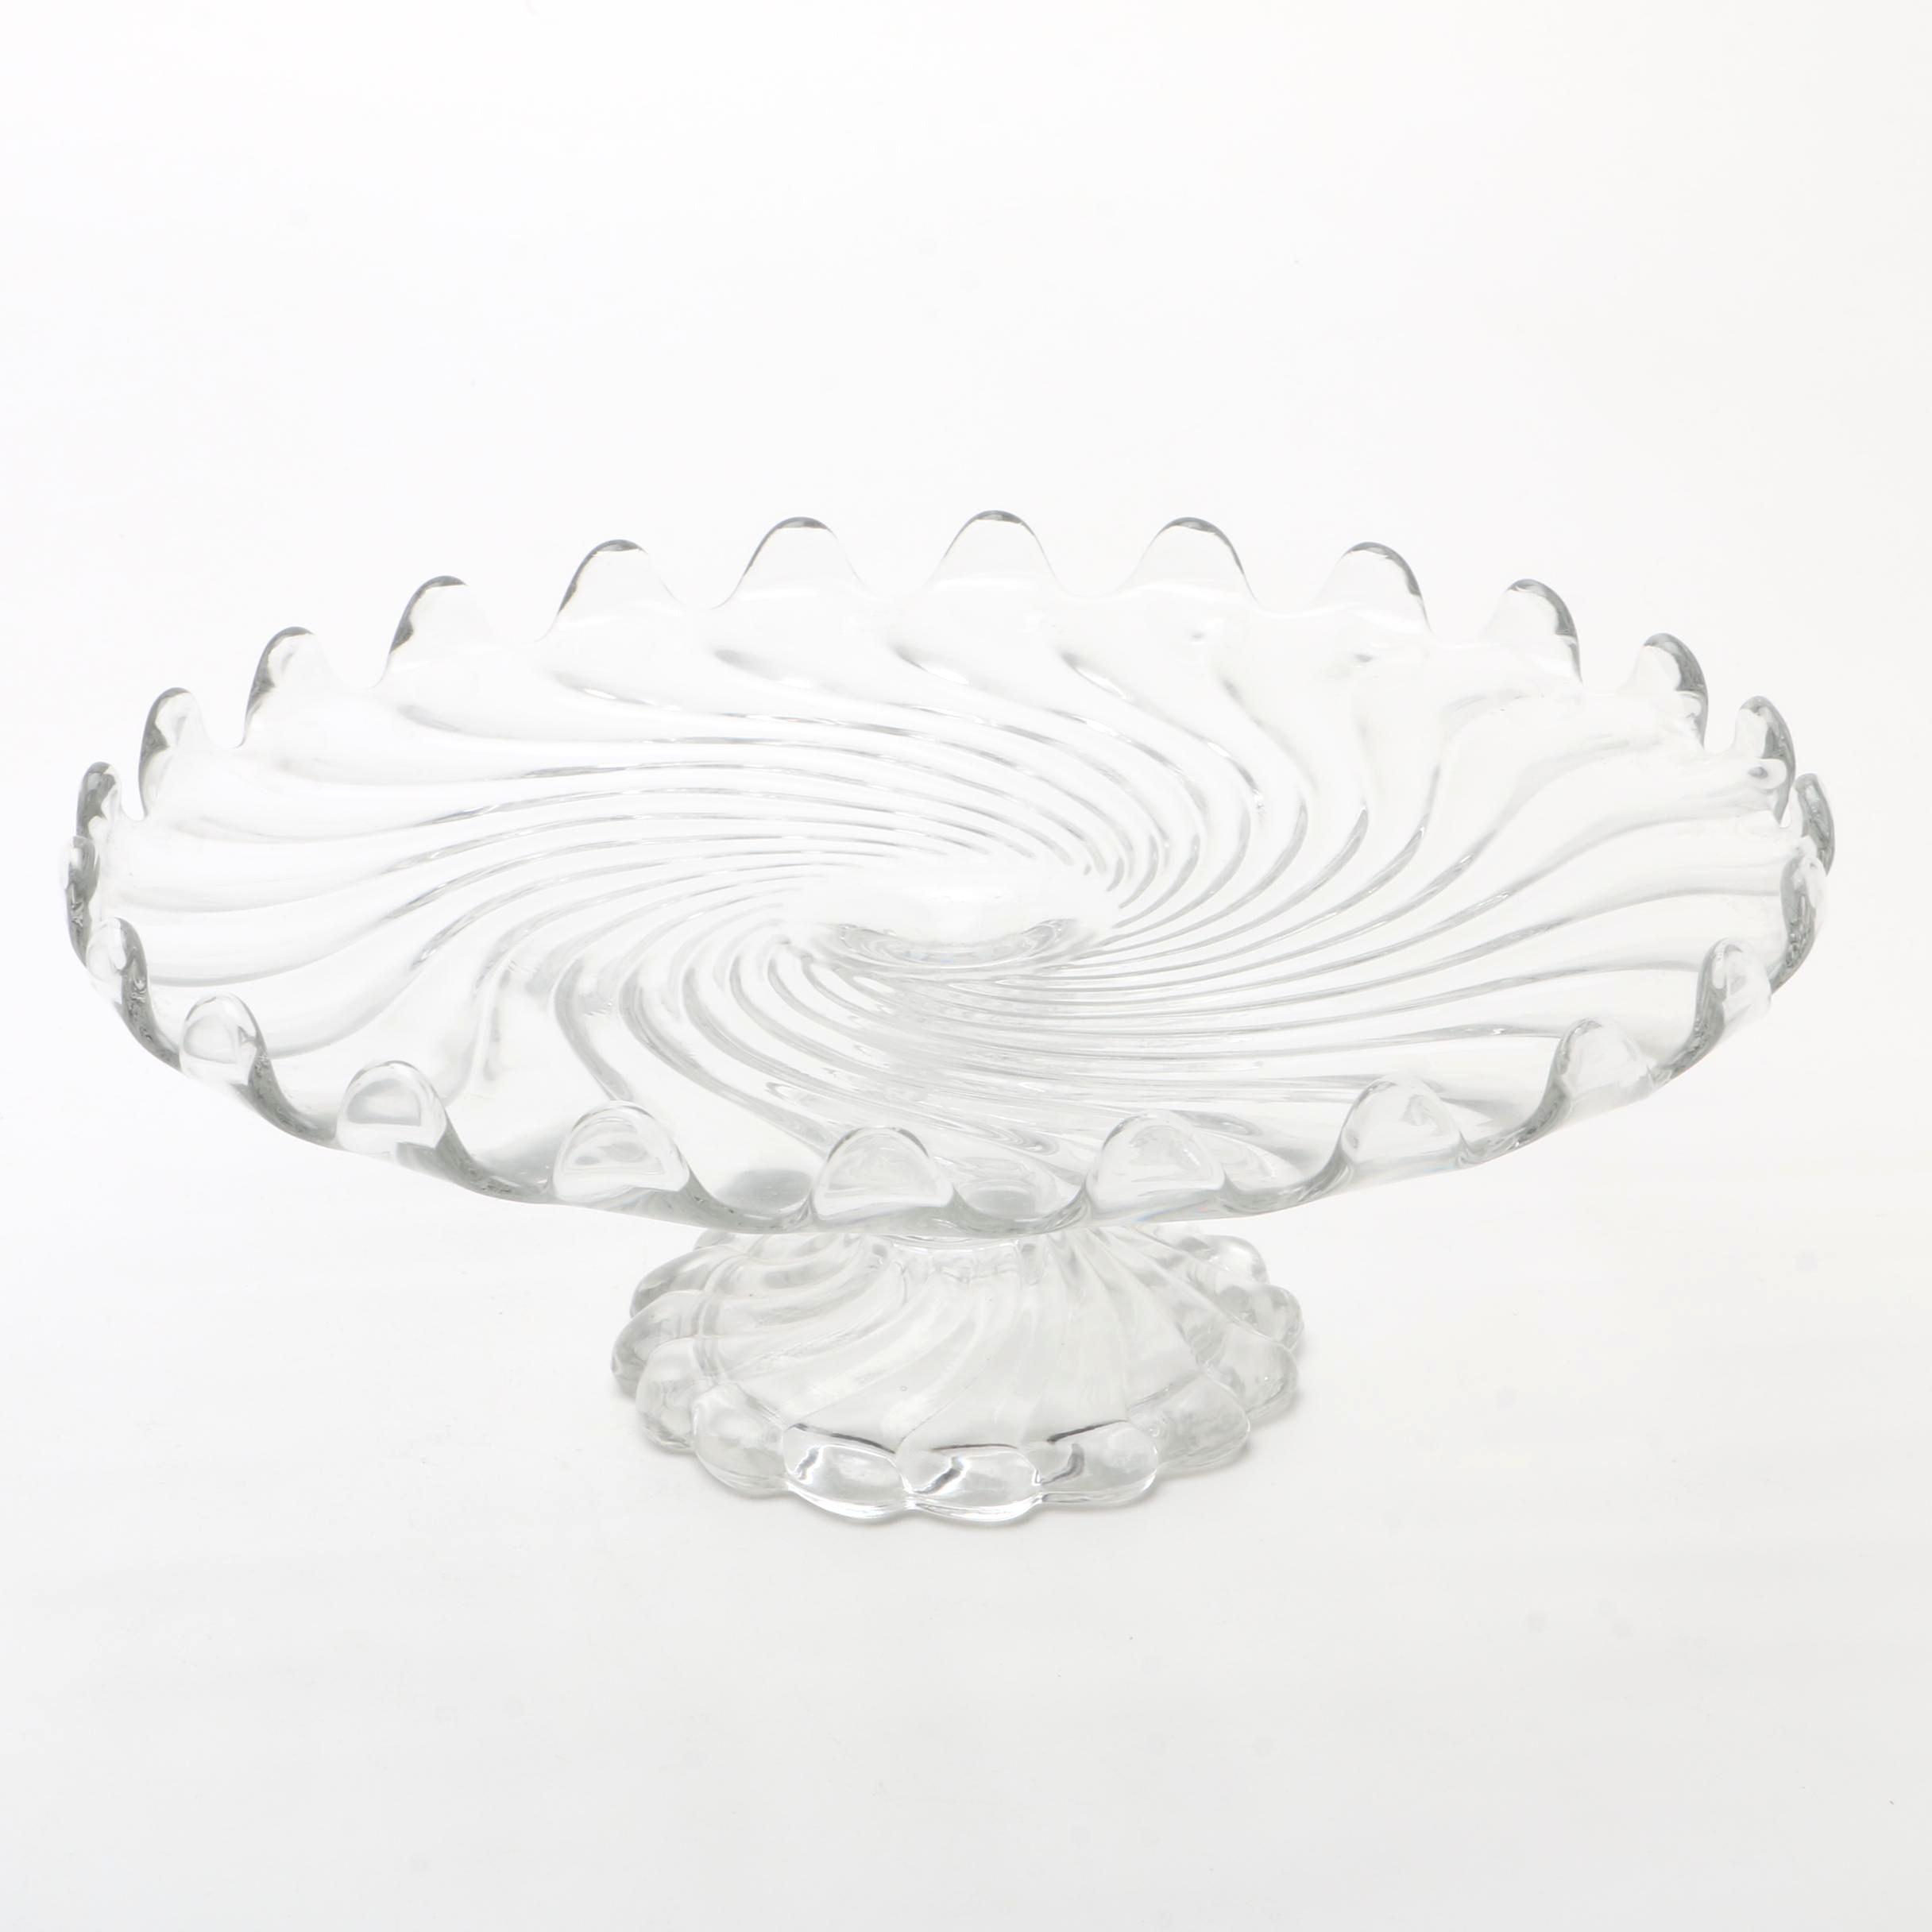 Vintage Swirled Glass Cake Stand